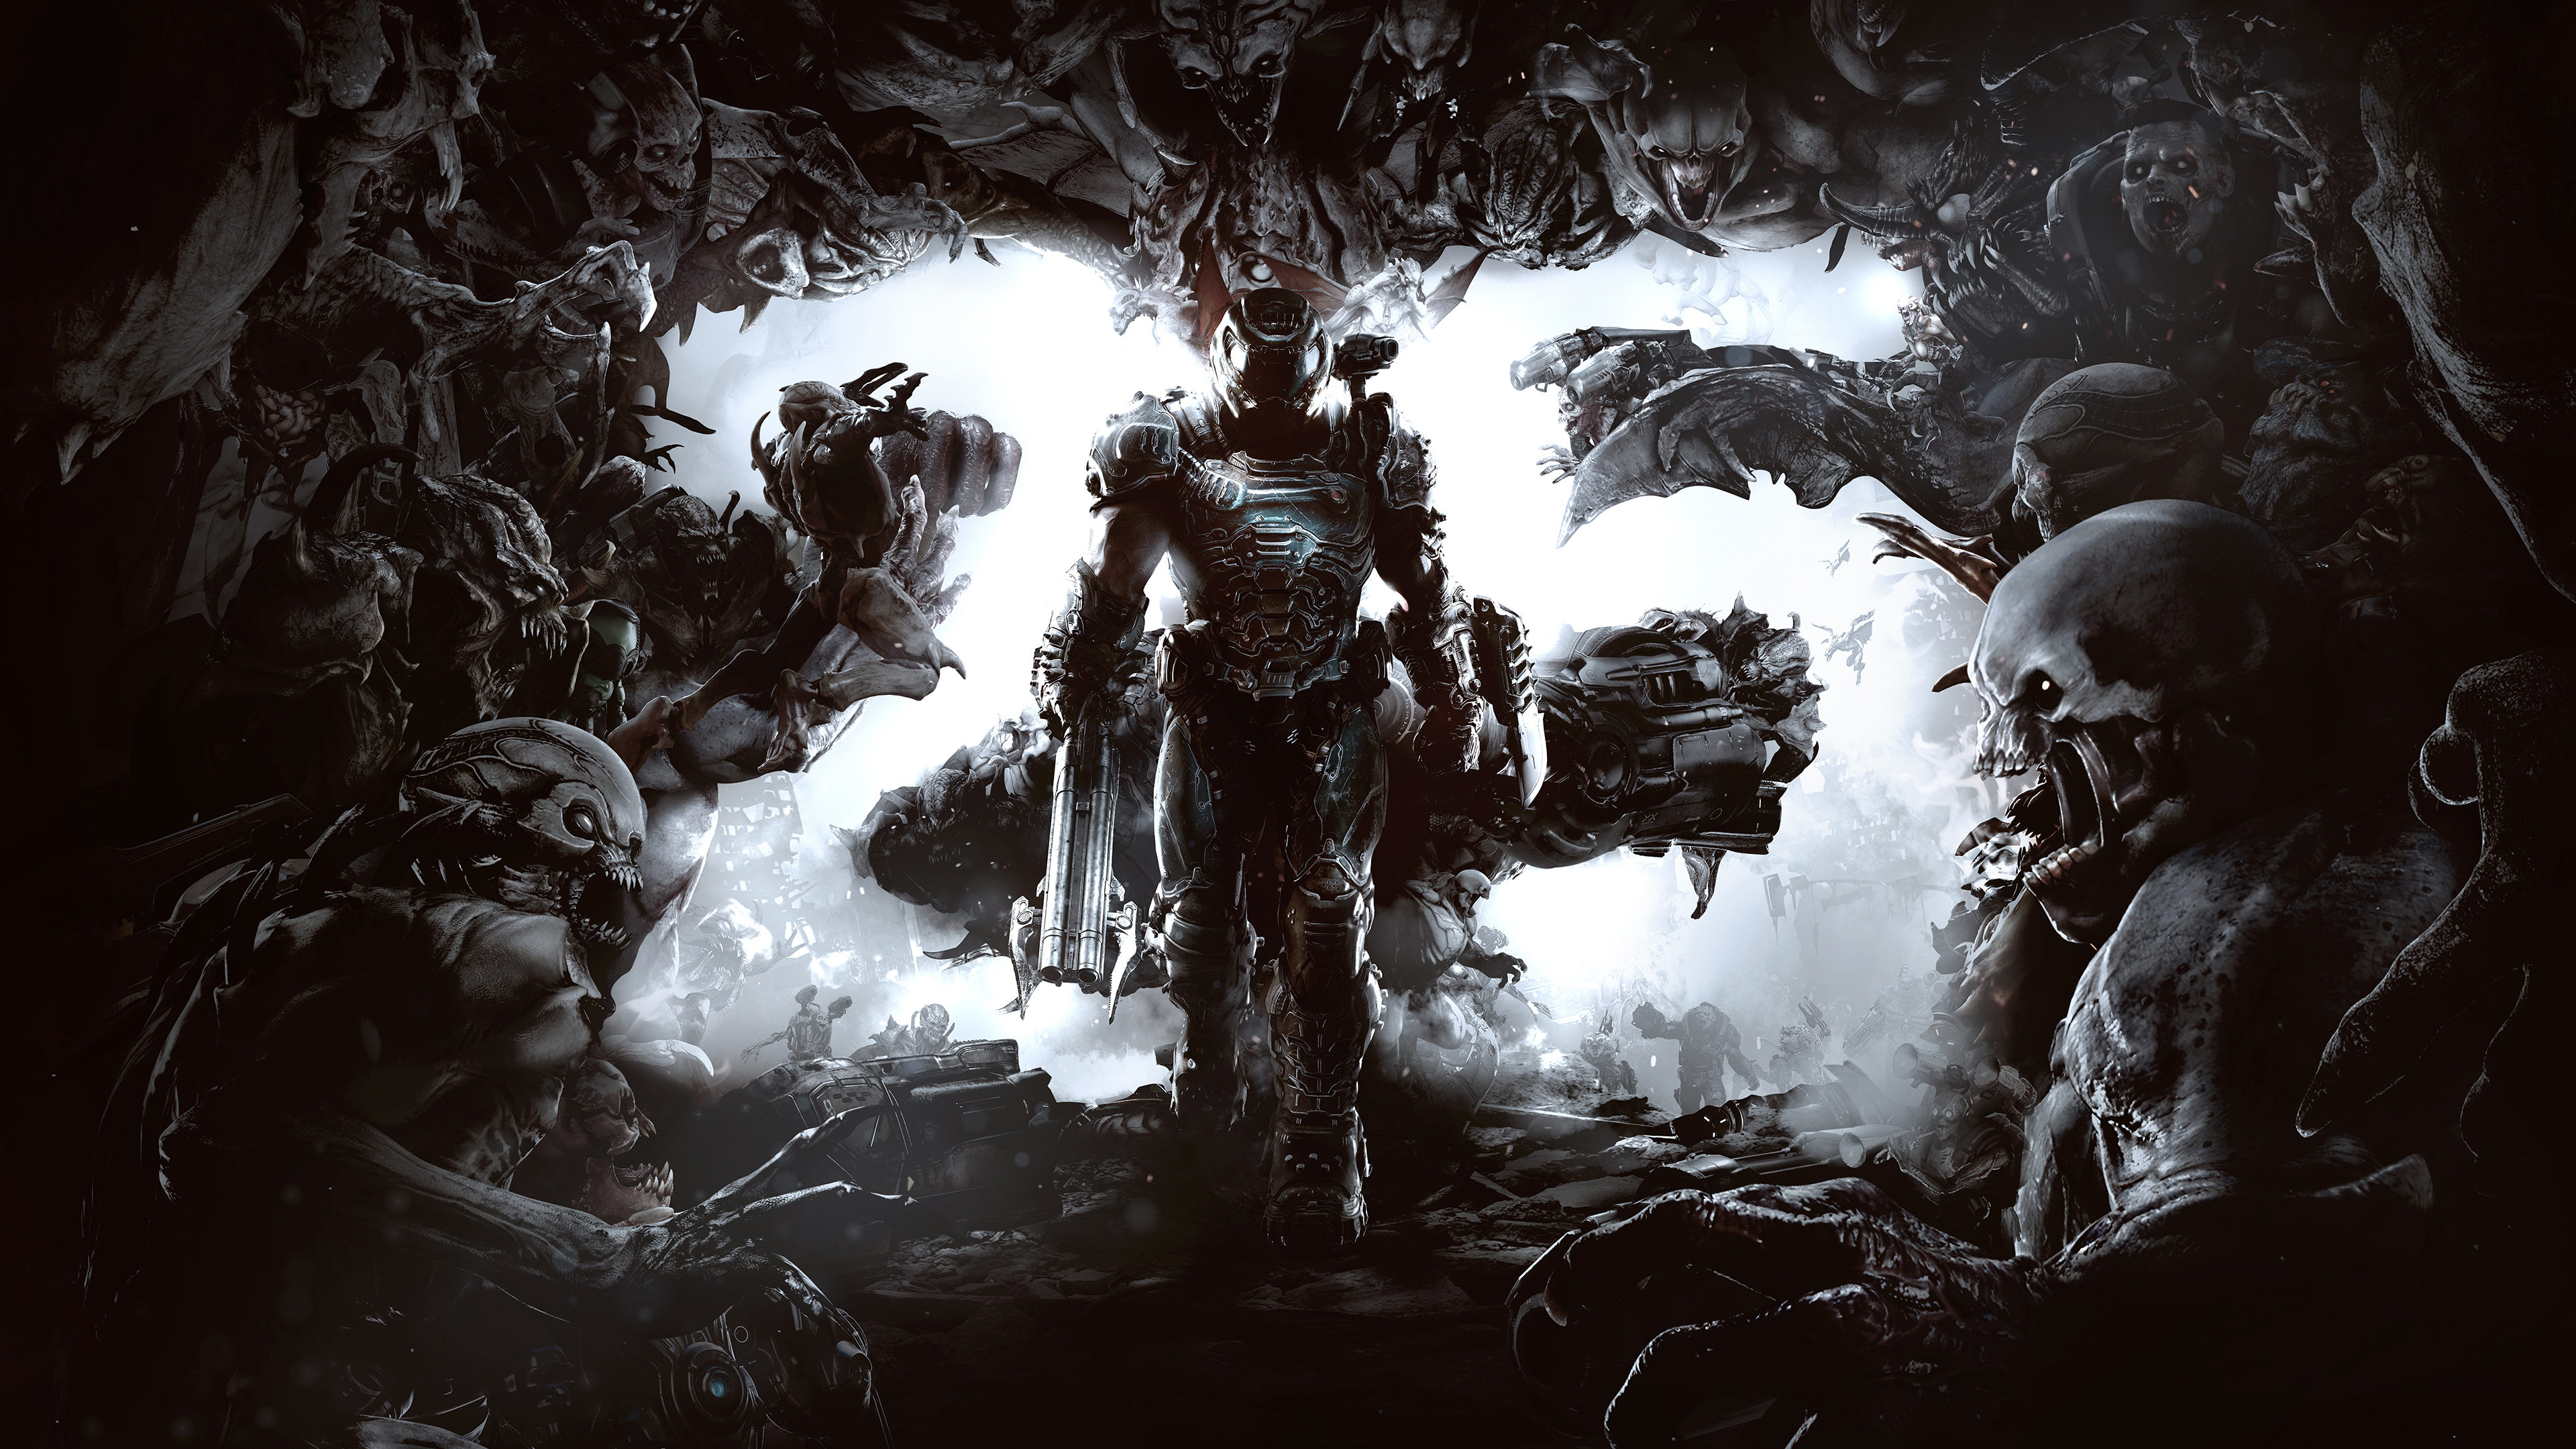 Doom 25th Anniversary 4k Ultra Hd Wallpaper Background Image 3840x2160 Id 975994 Wallpaper Abyss